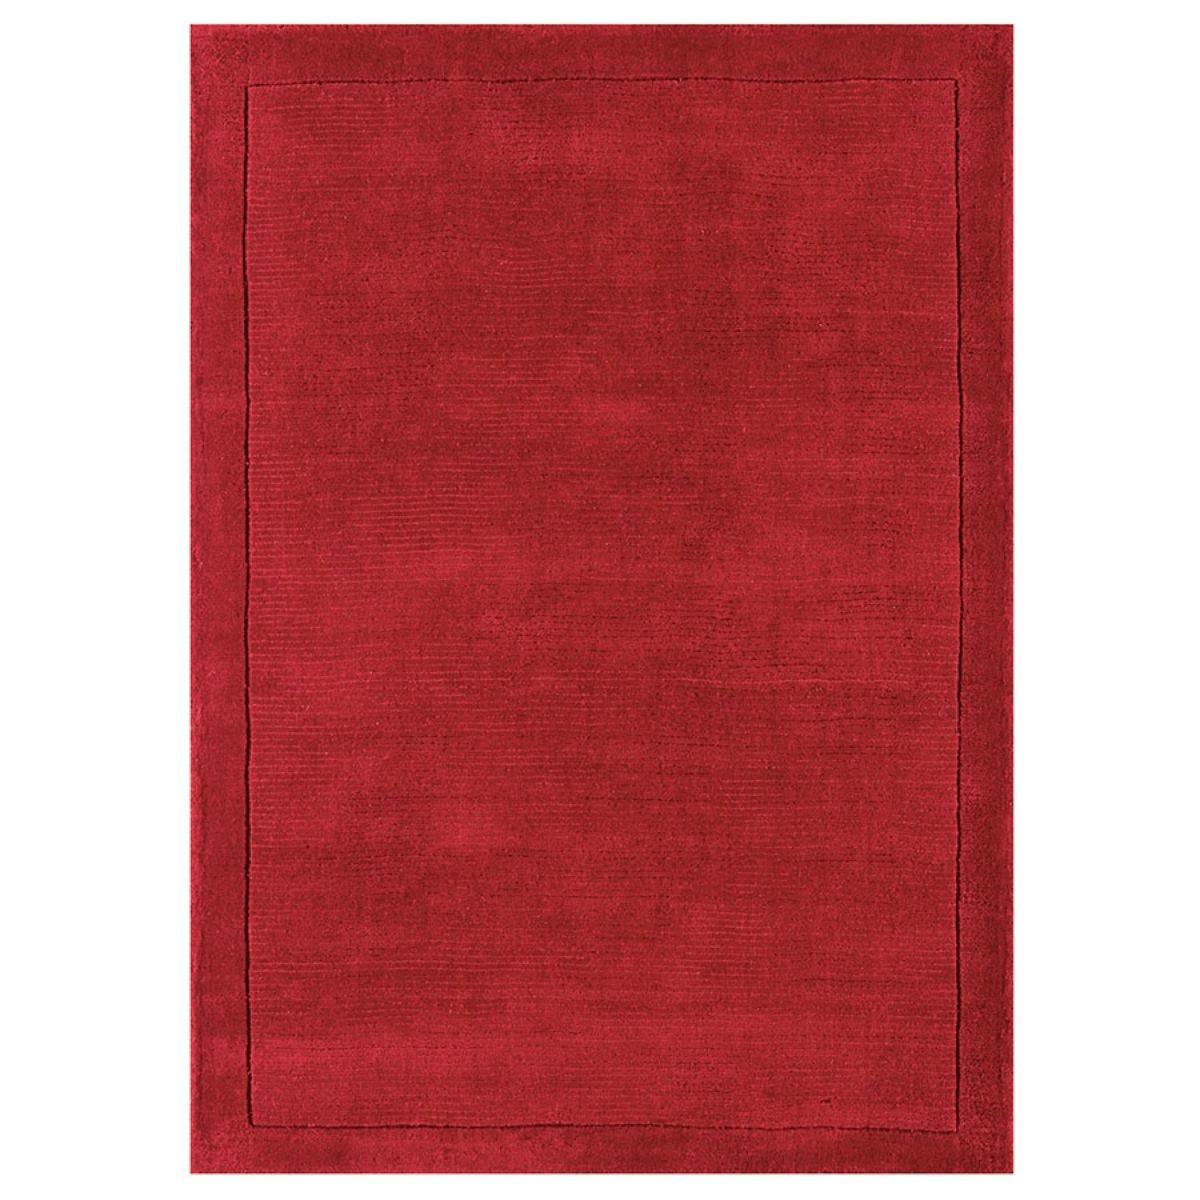 Asiatic Small York Handloom Rug